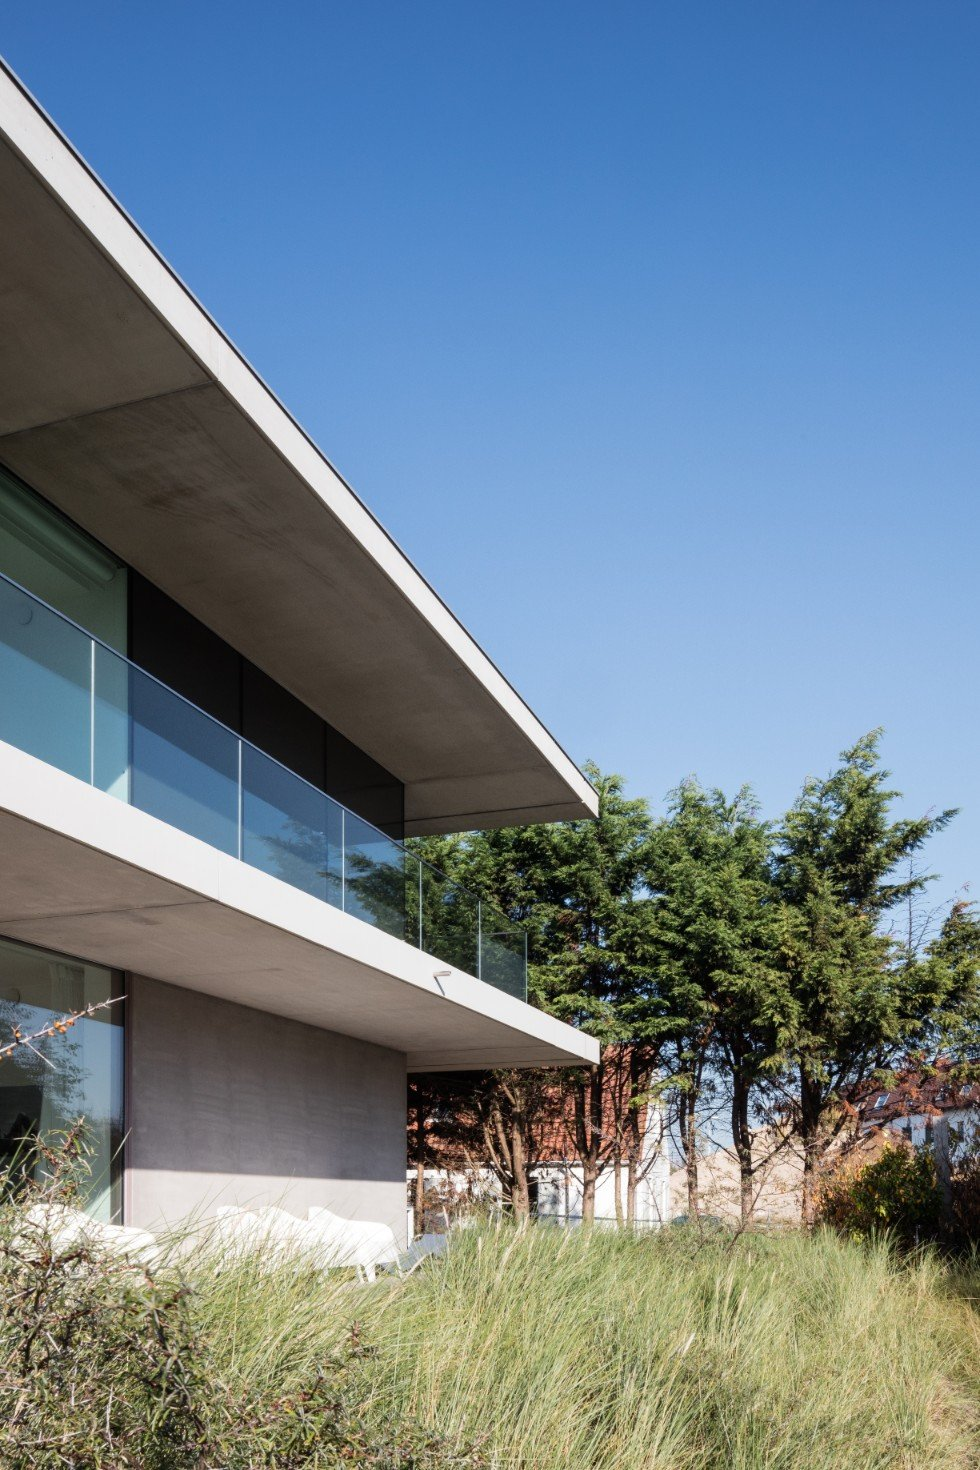 Rietveldprojects.be-Twins-Gropius-Breuer-appartement-design-architectuur-kust6.jpg